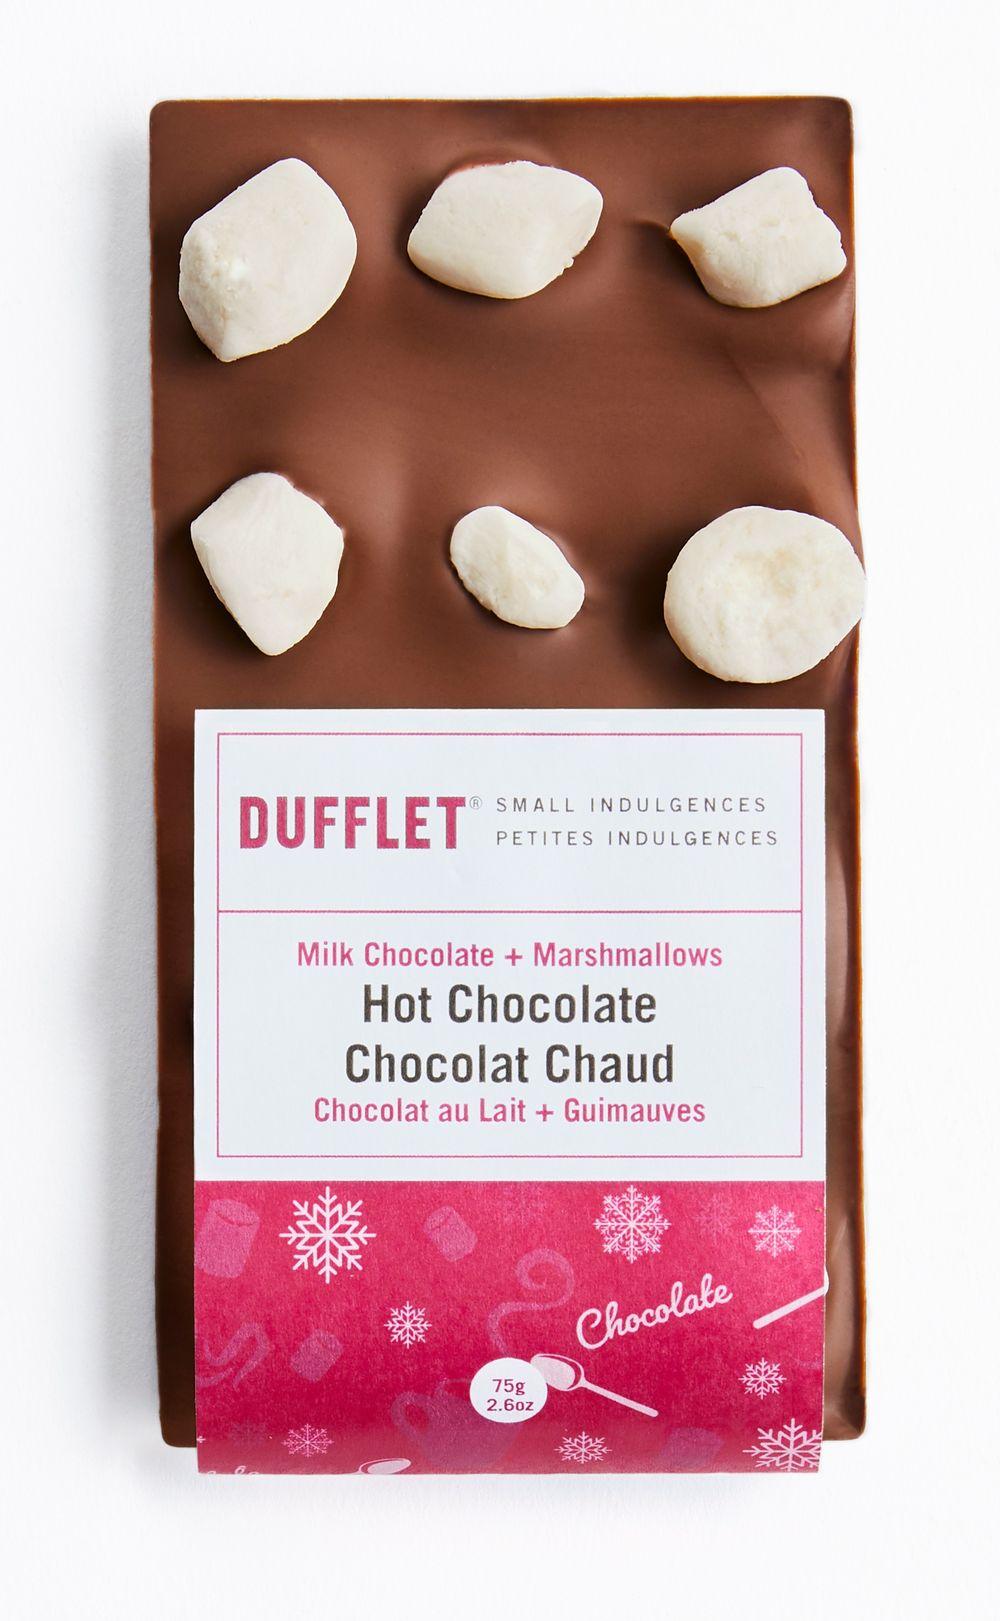 Milk Chocolate and Marshmallows Hot Chocolate